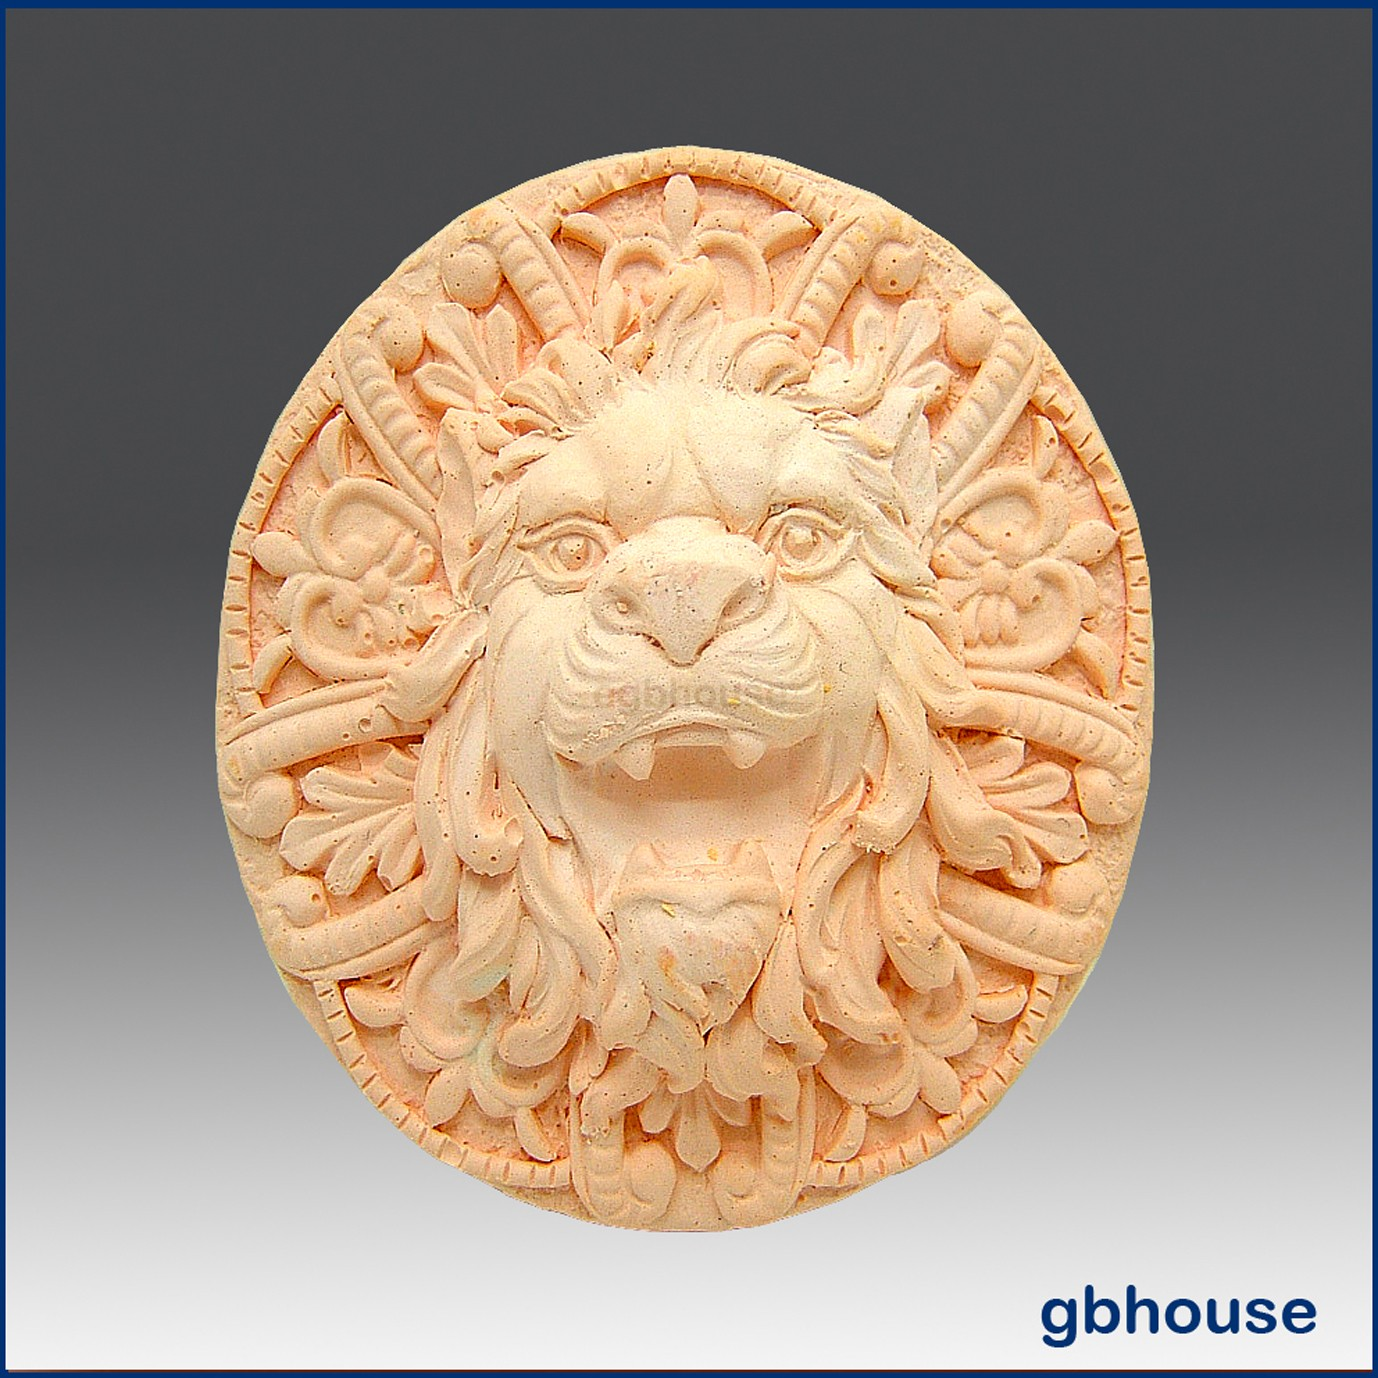 Roaring Lion Rosette - Detail of high relief sculpture